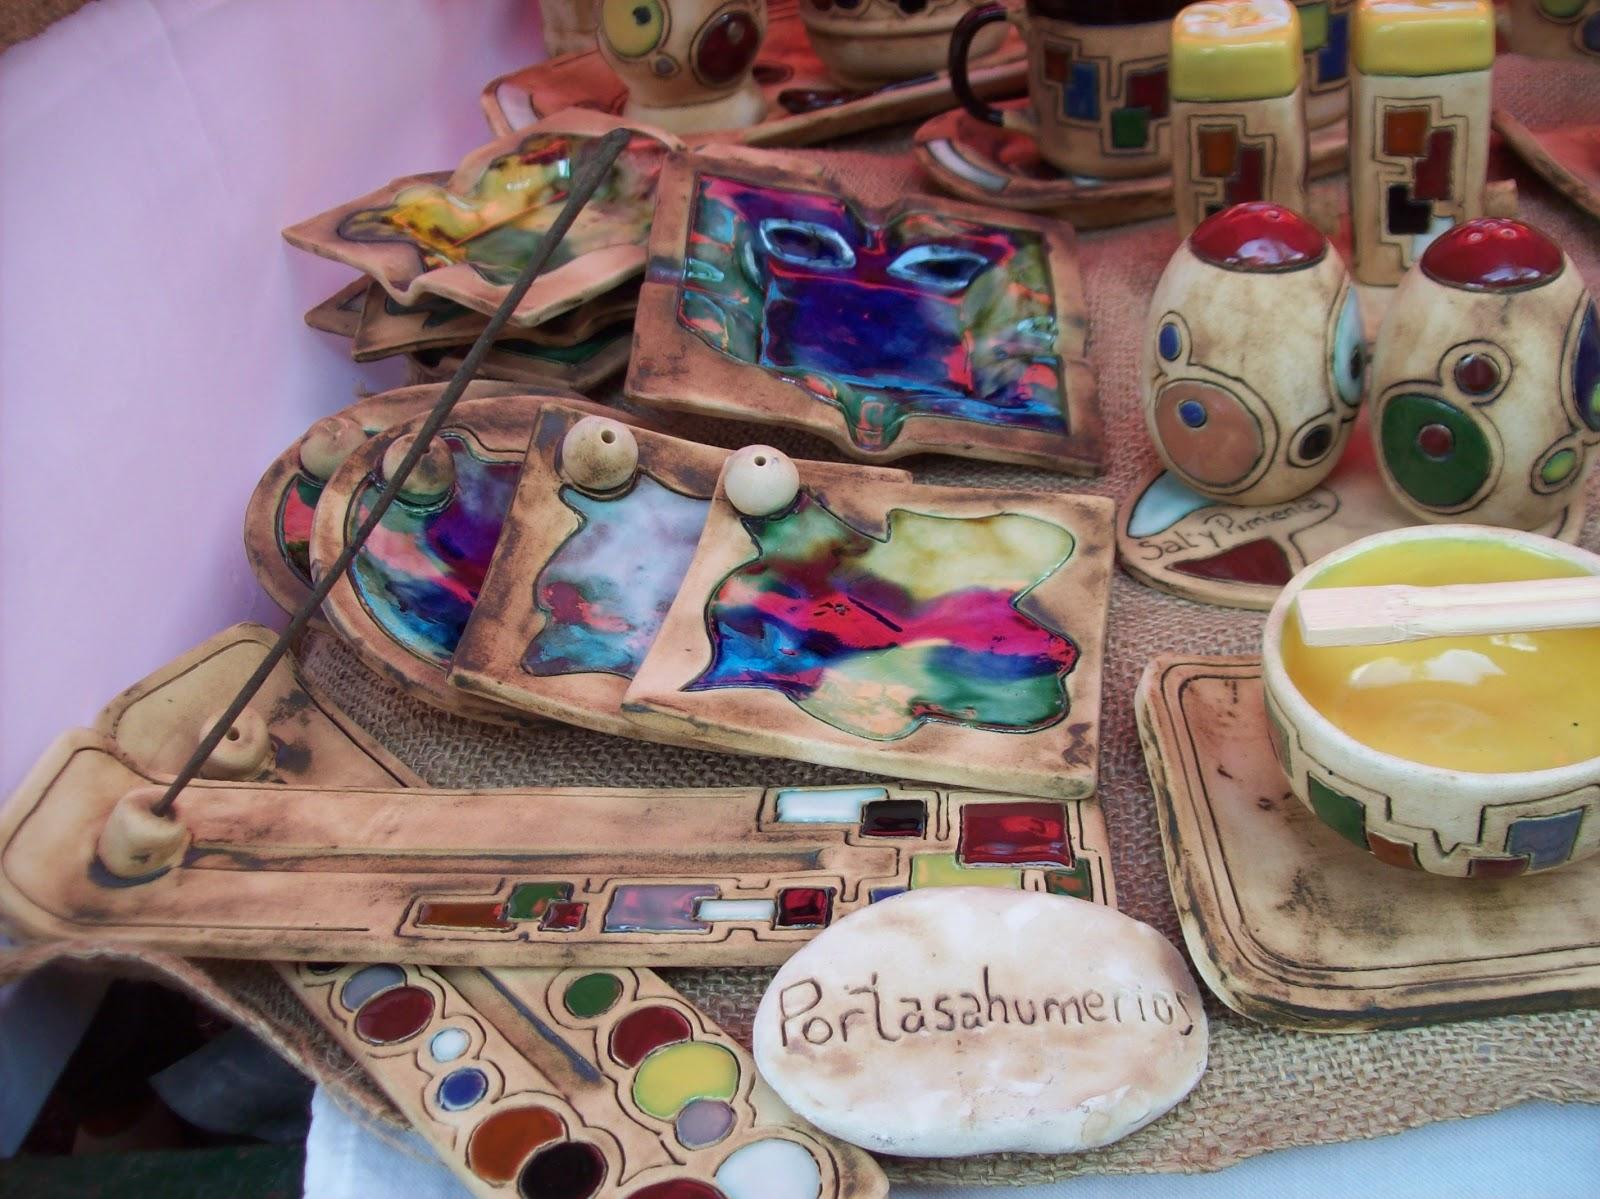 Ceramica Artesanal Melipal Porta Sahumerios